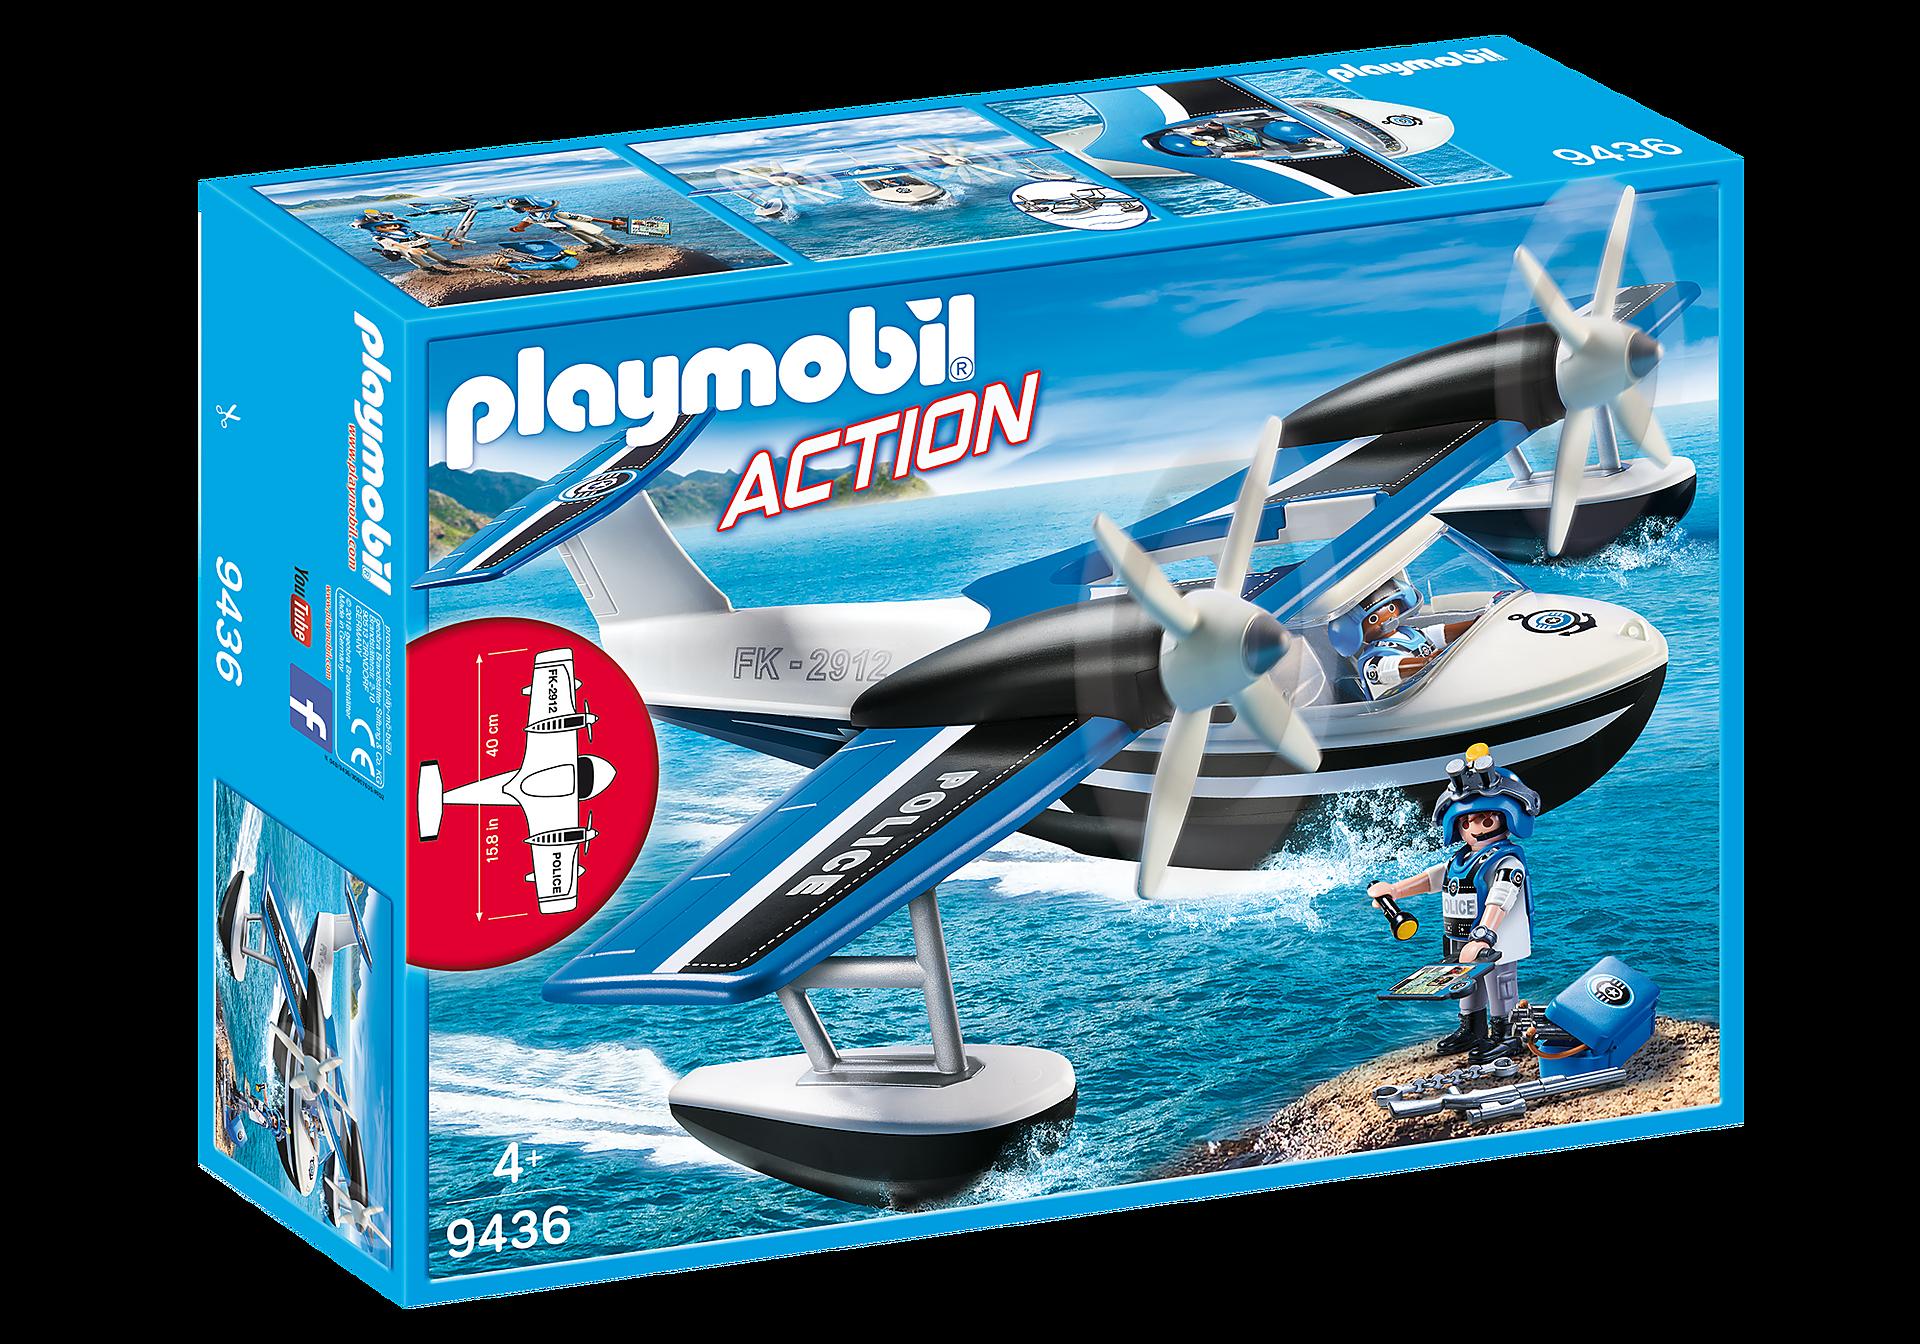 http://media.playmobil.com/i/playmobil/9436_product_box_front/Αστυνομικό υδροπλάνο